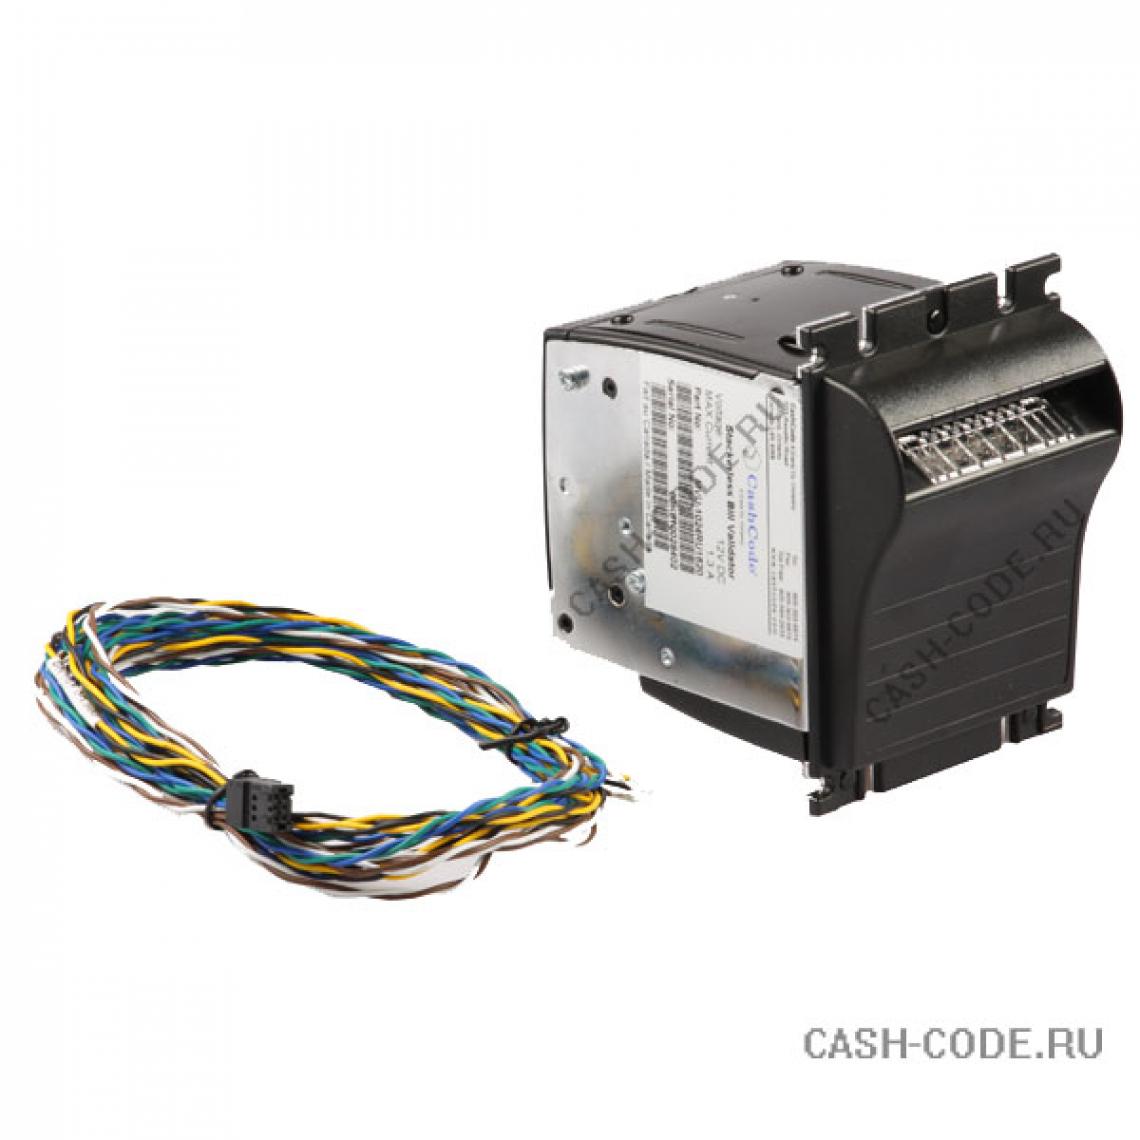 cashcodeMVU_1